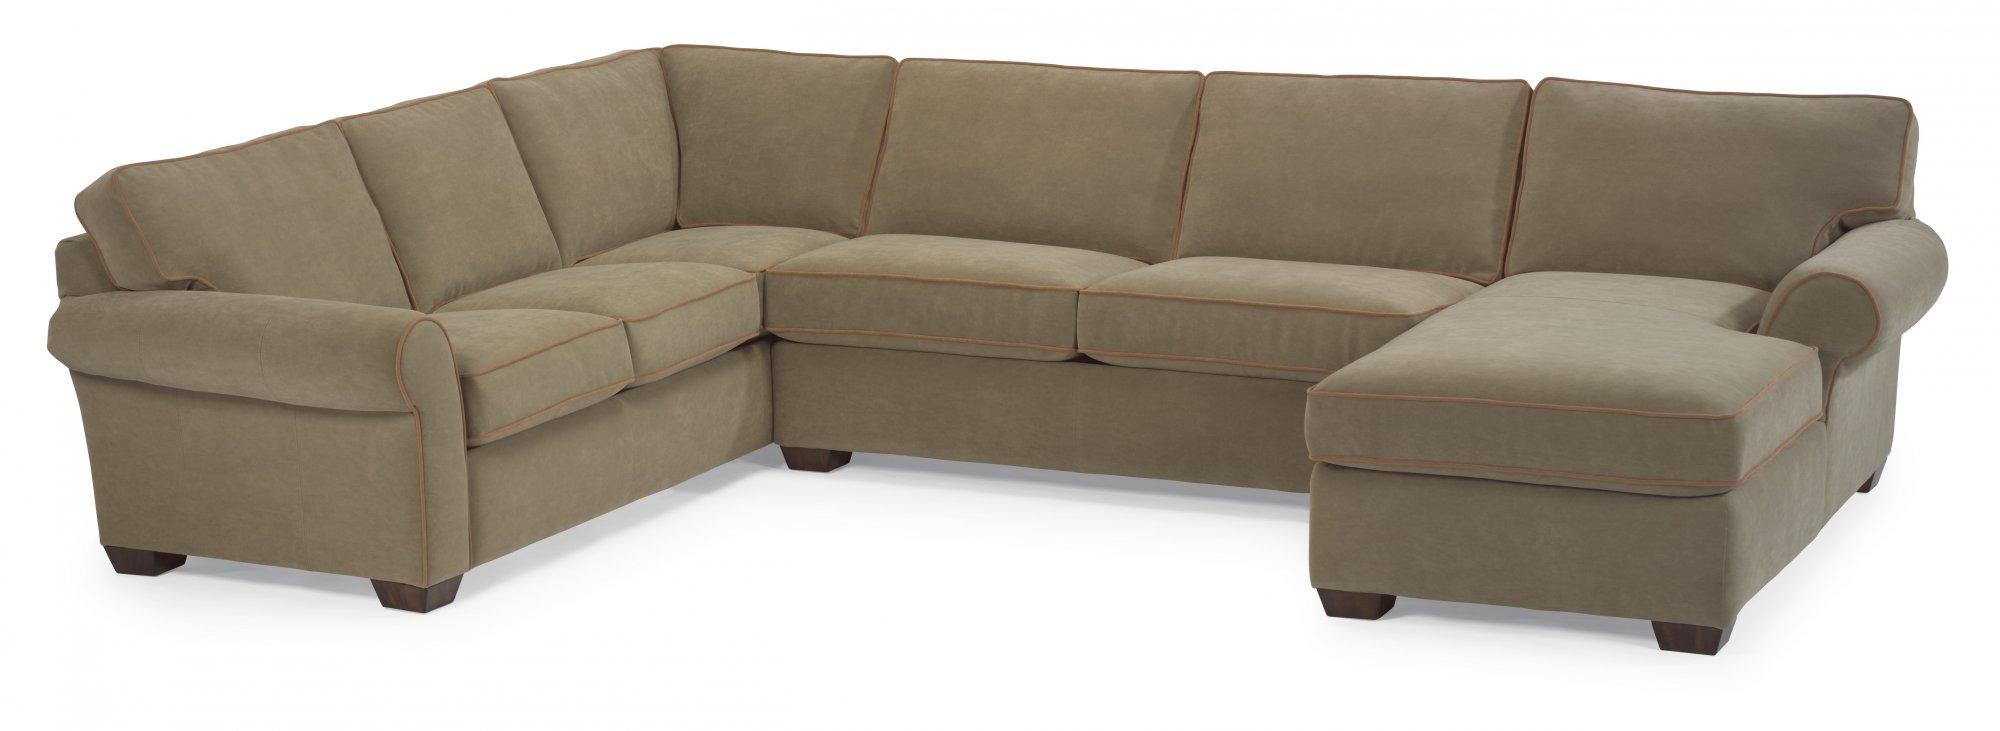 Leather Sectional  sc 1 st  Flexsteel : flexsteel sectional leather - Sectionals, Sofas & Couches